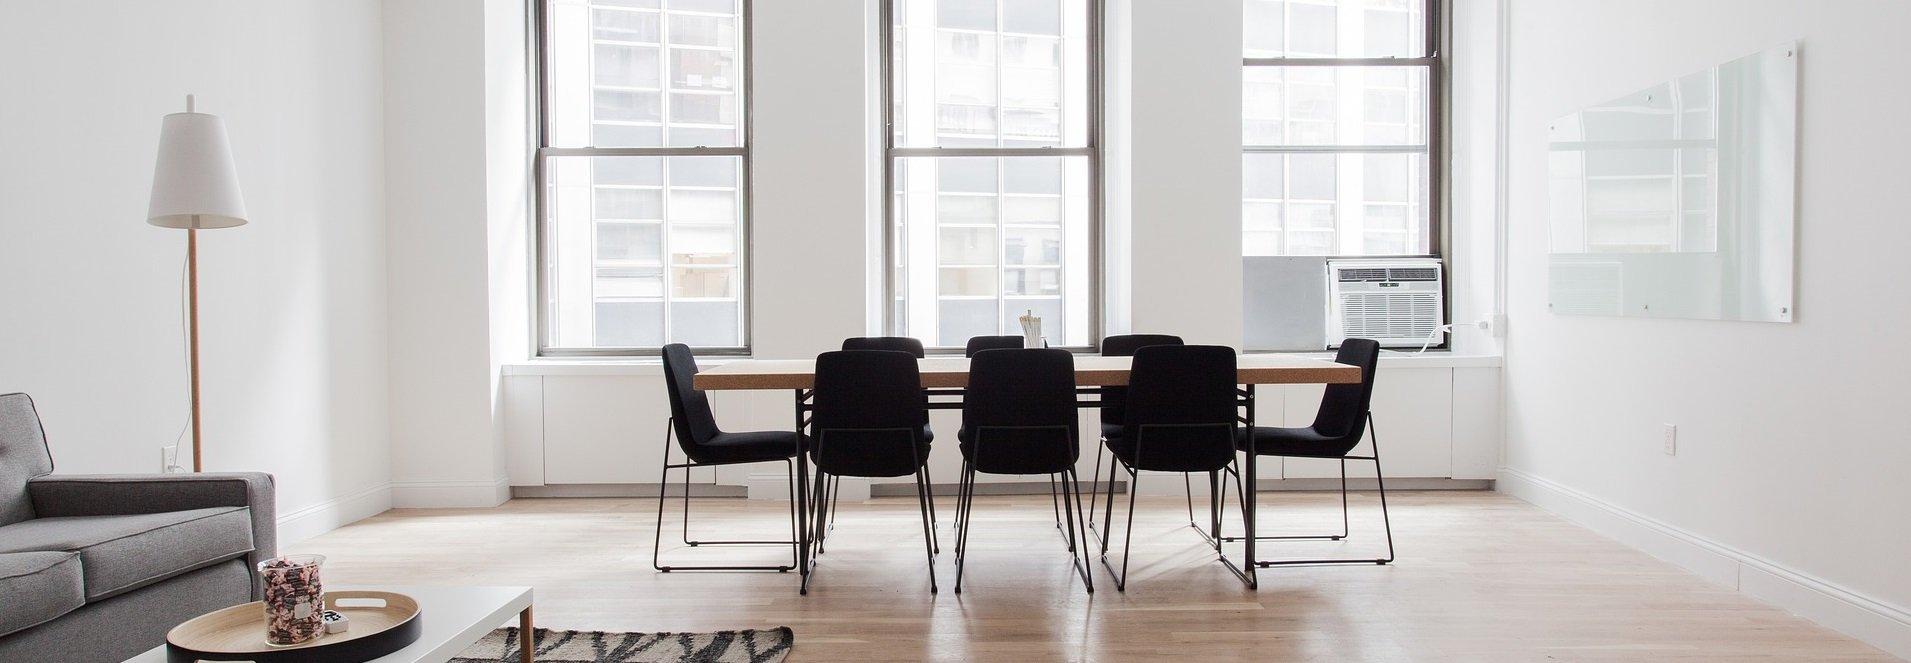 chairs-2181947_1920 – Kopi